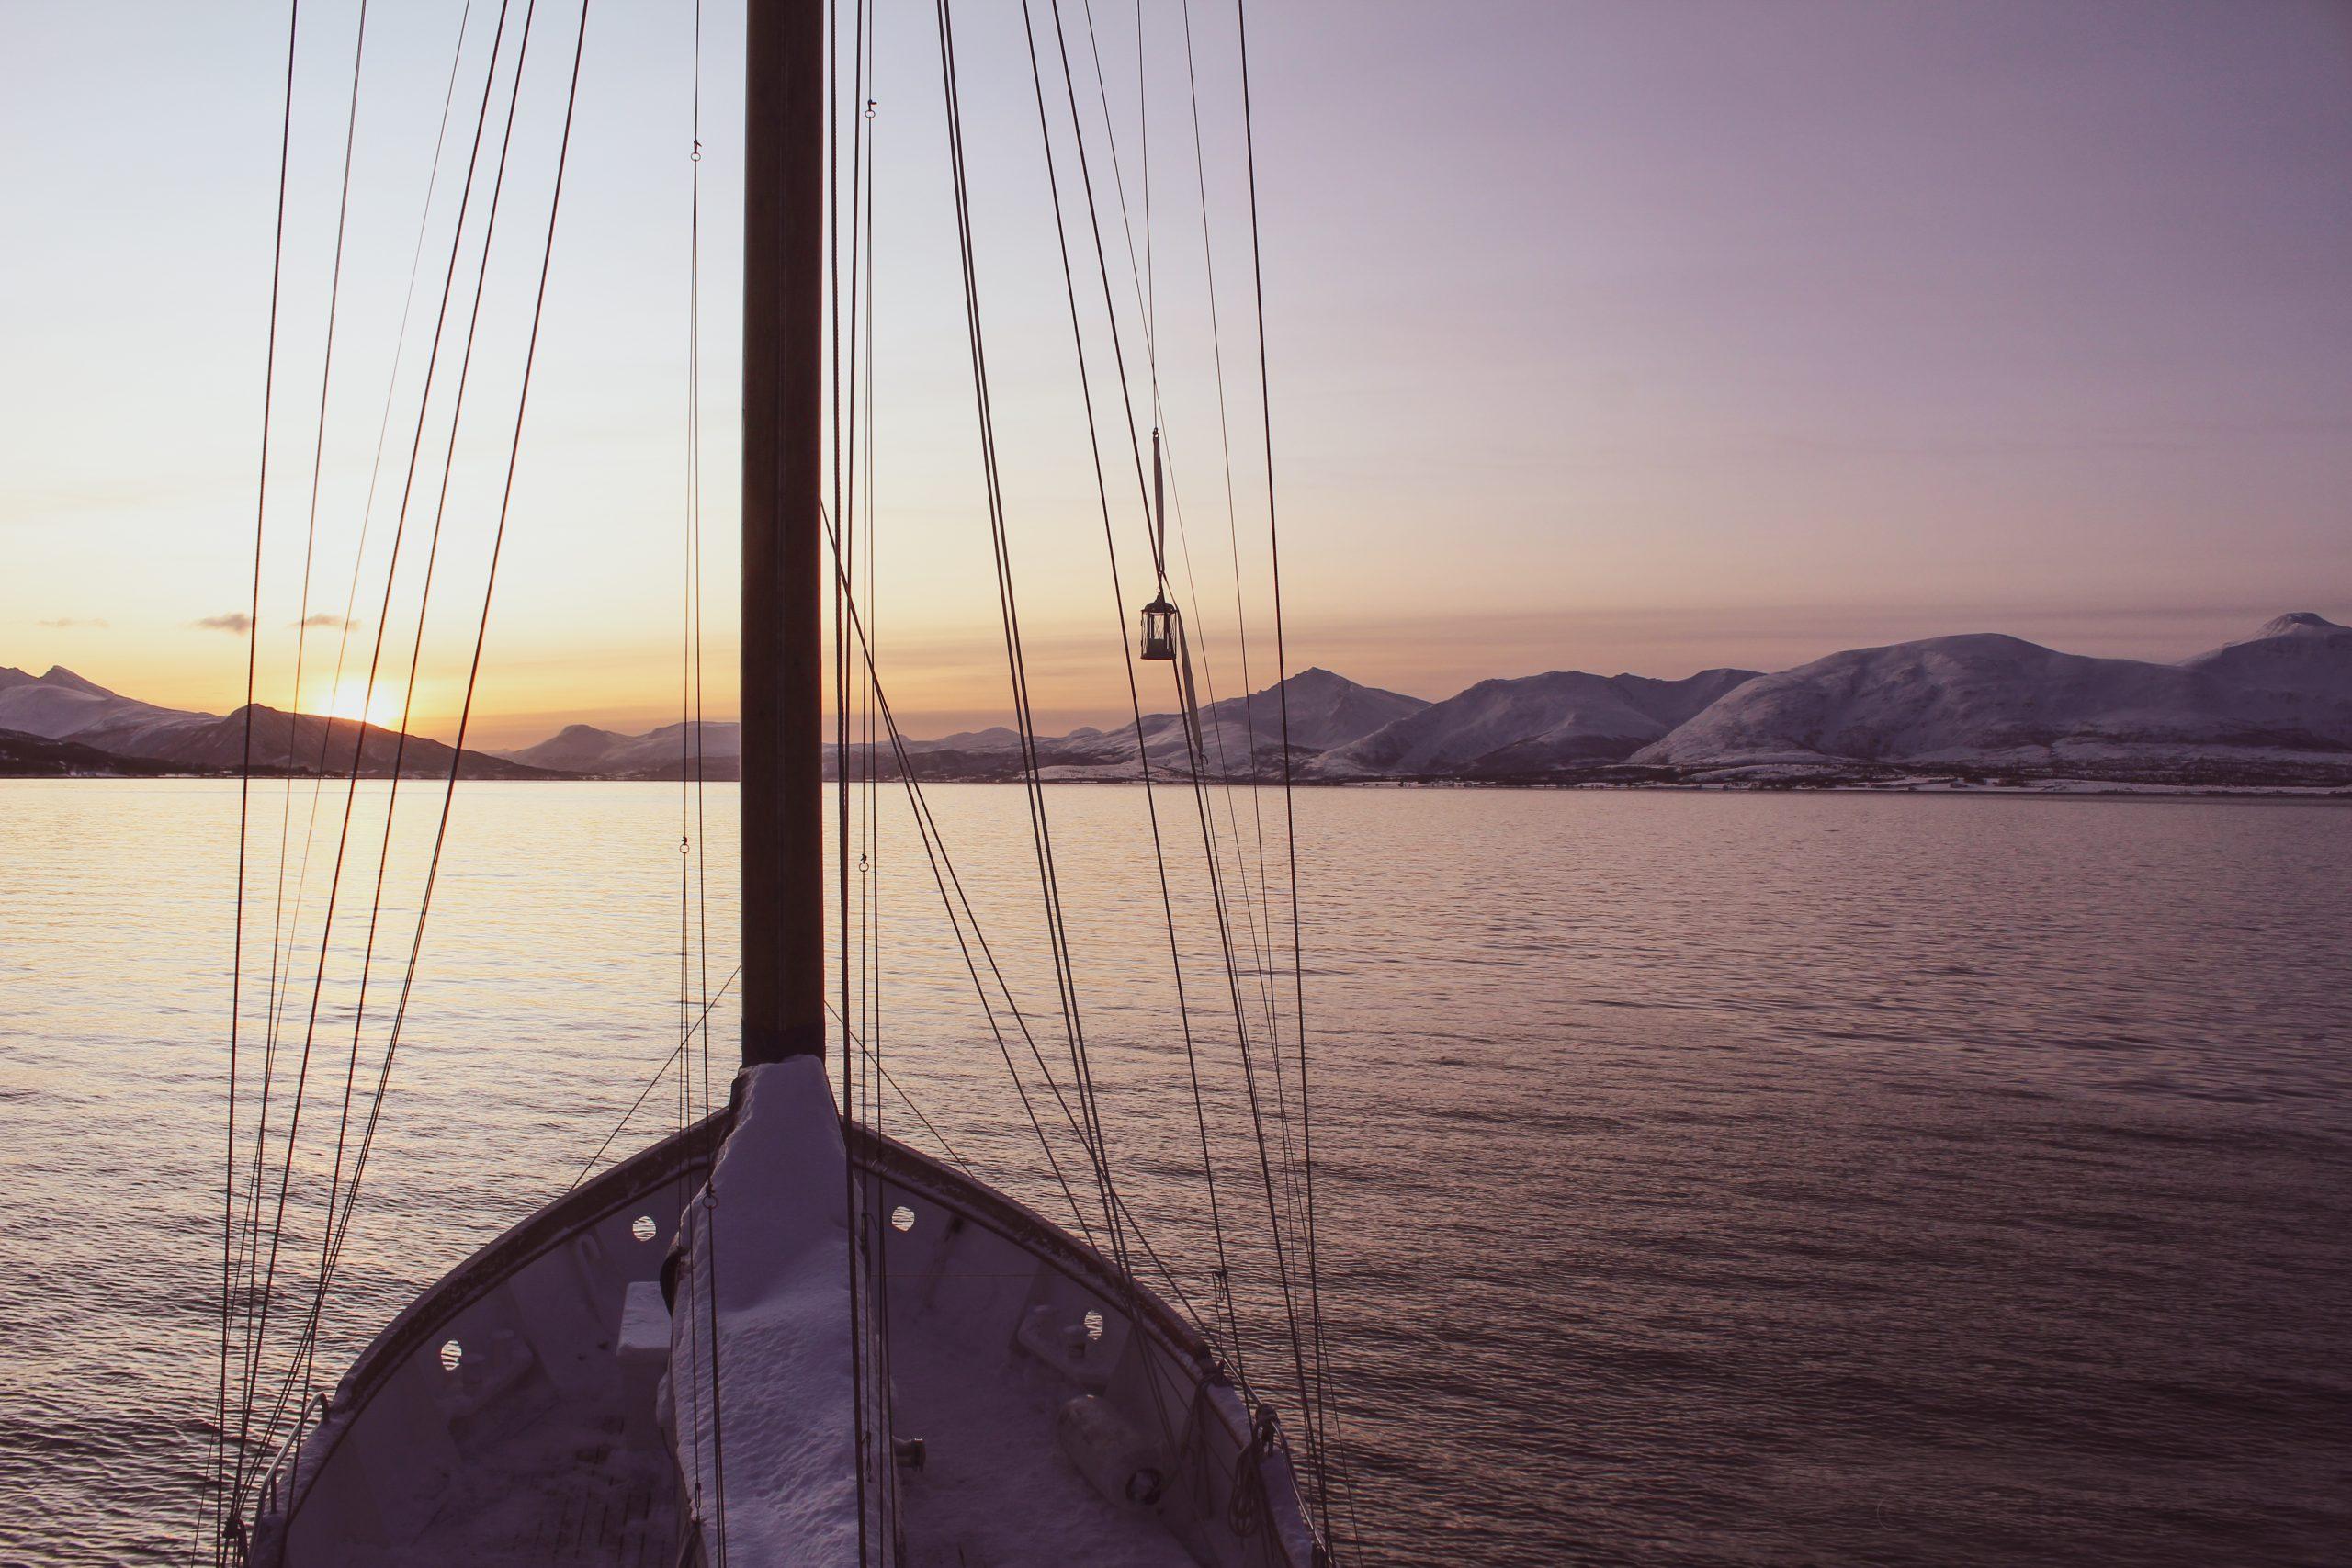 sunrise onboard stella oceana sailing boat tromso